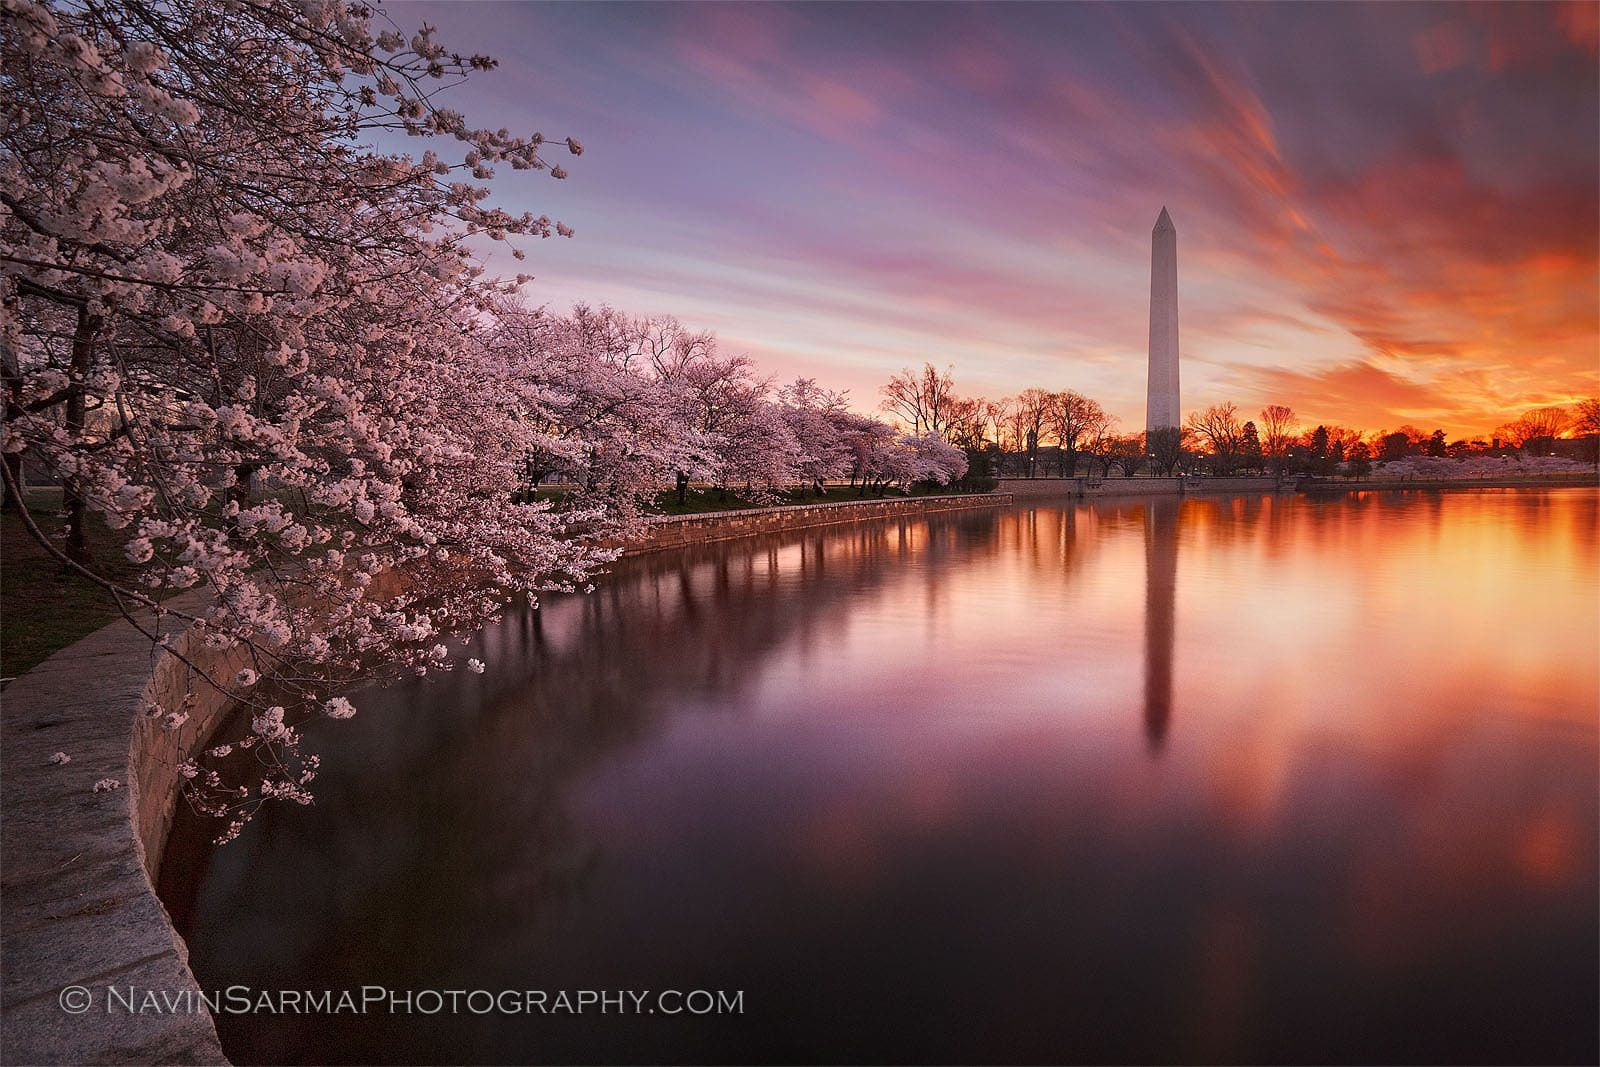 Cherry Blossoms Dc 2021 Peak Bloom Prediction And Travel Guide Cherry Blossom Dc Cherry Blossom Festival Cherry Blossom